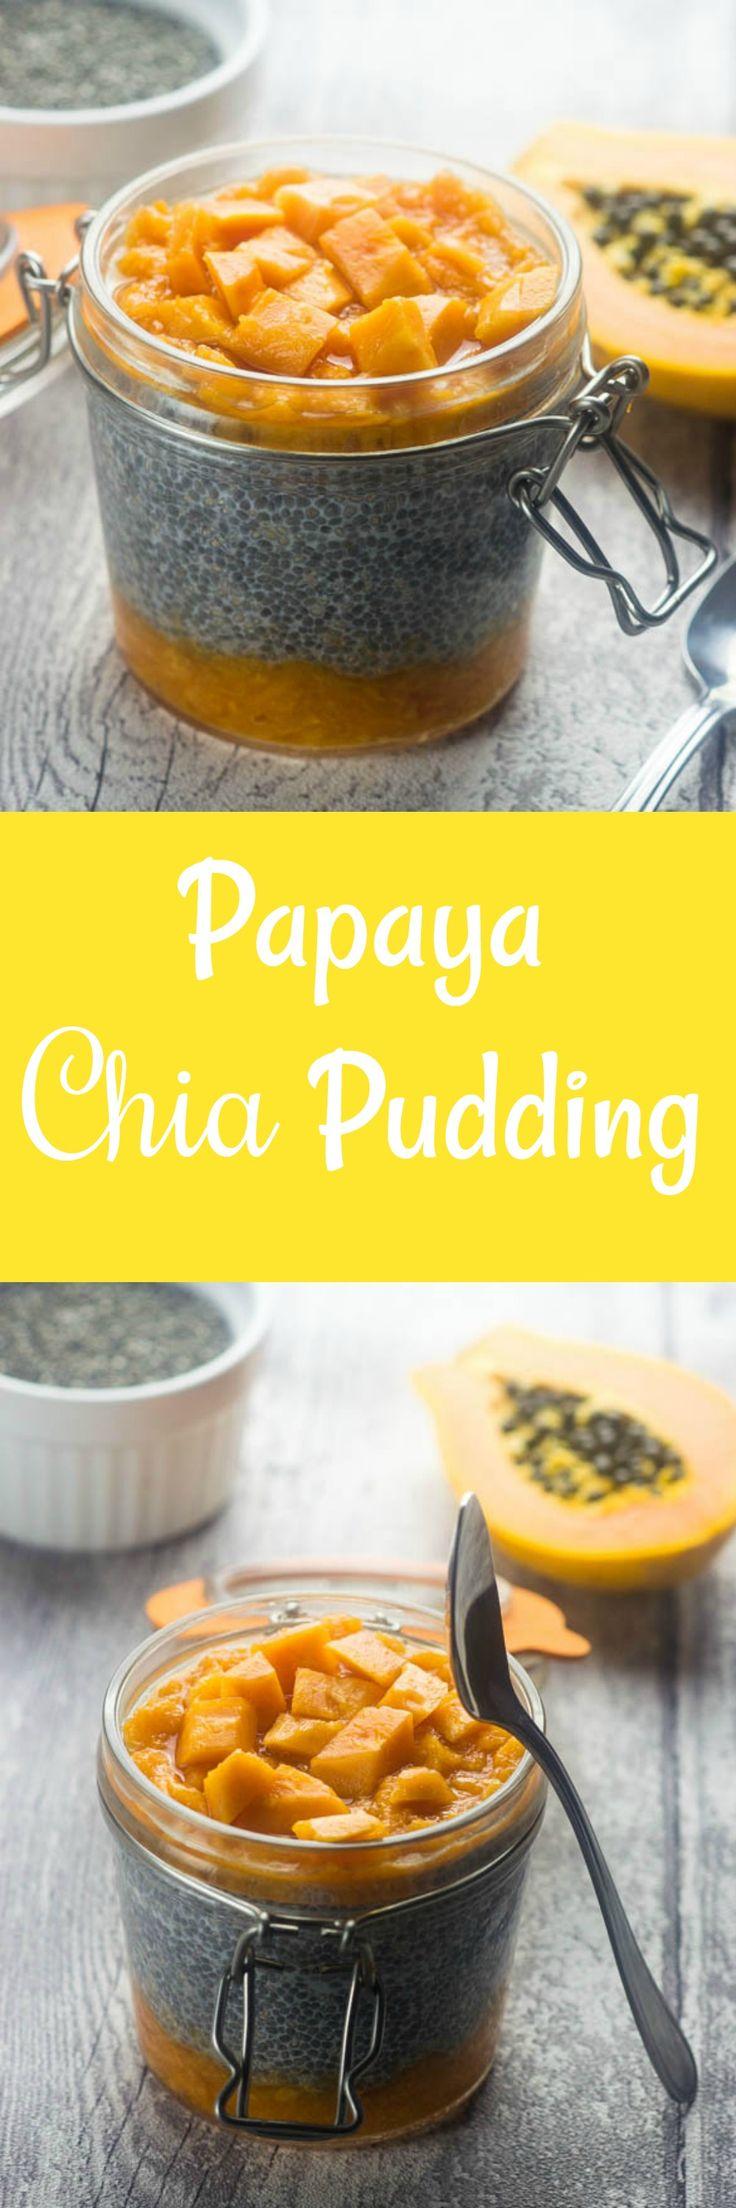 Papaya (paw paw) chia pudding